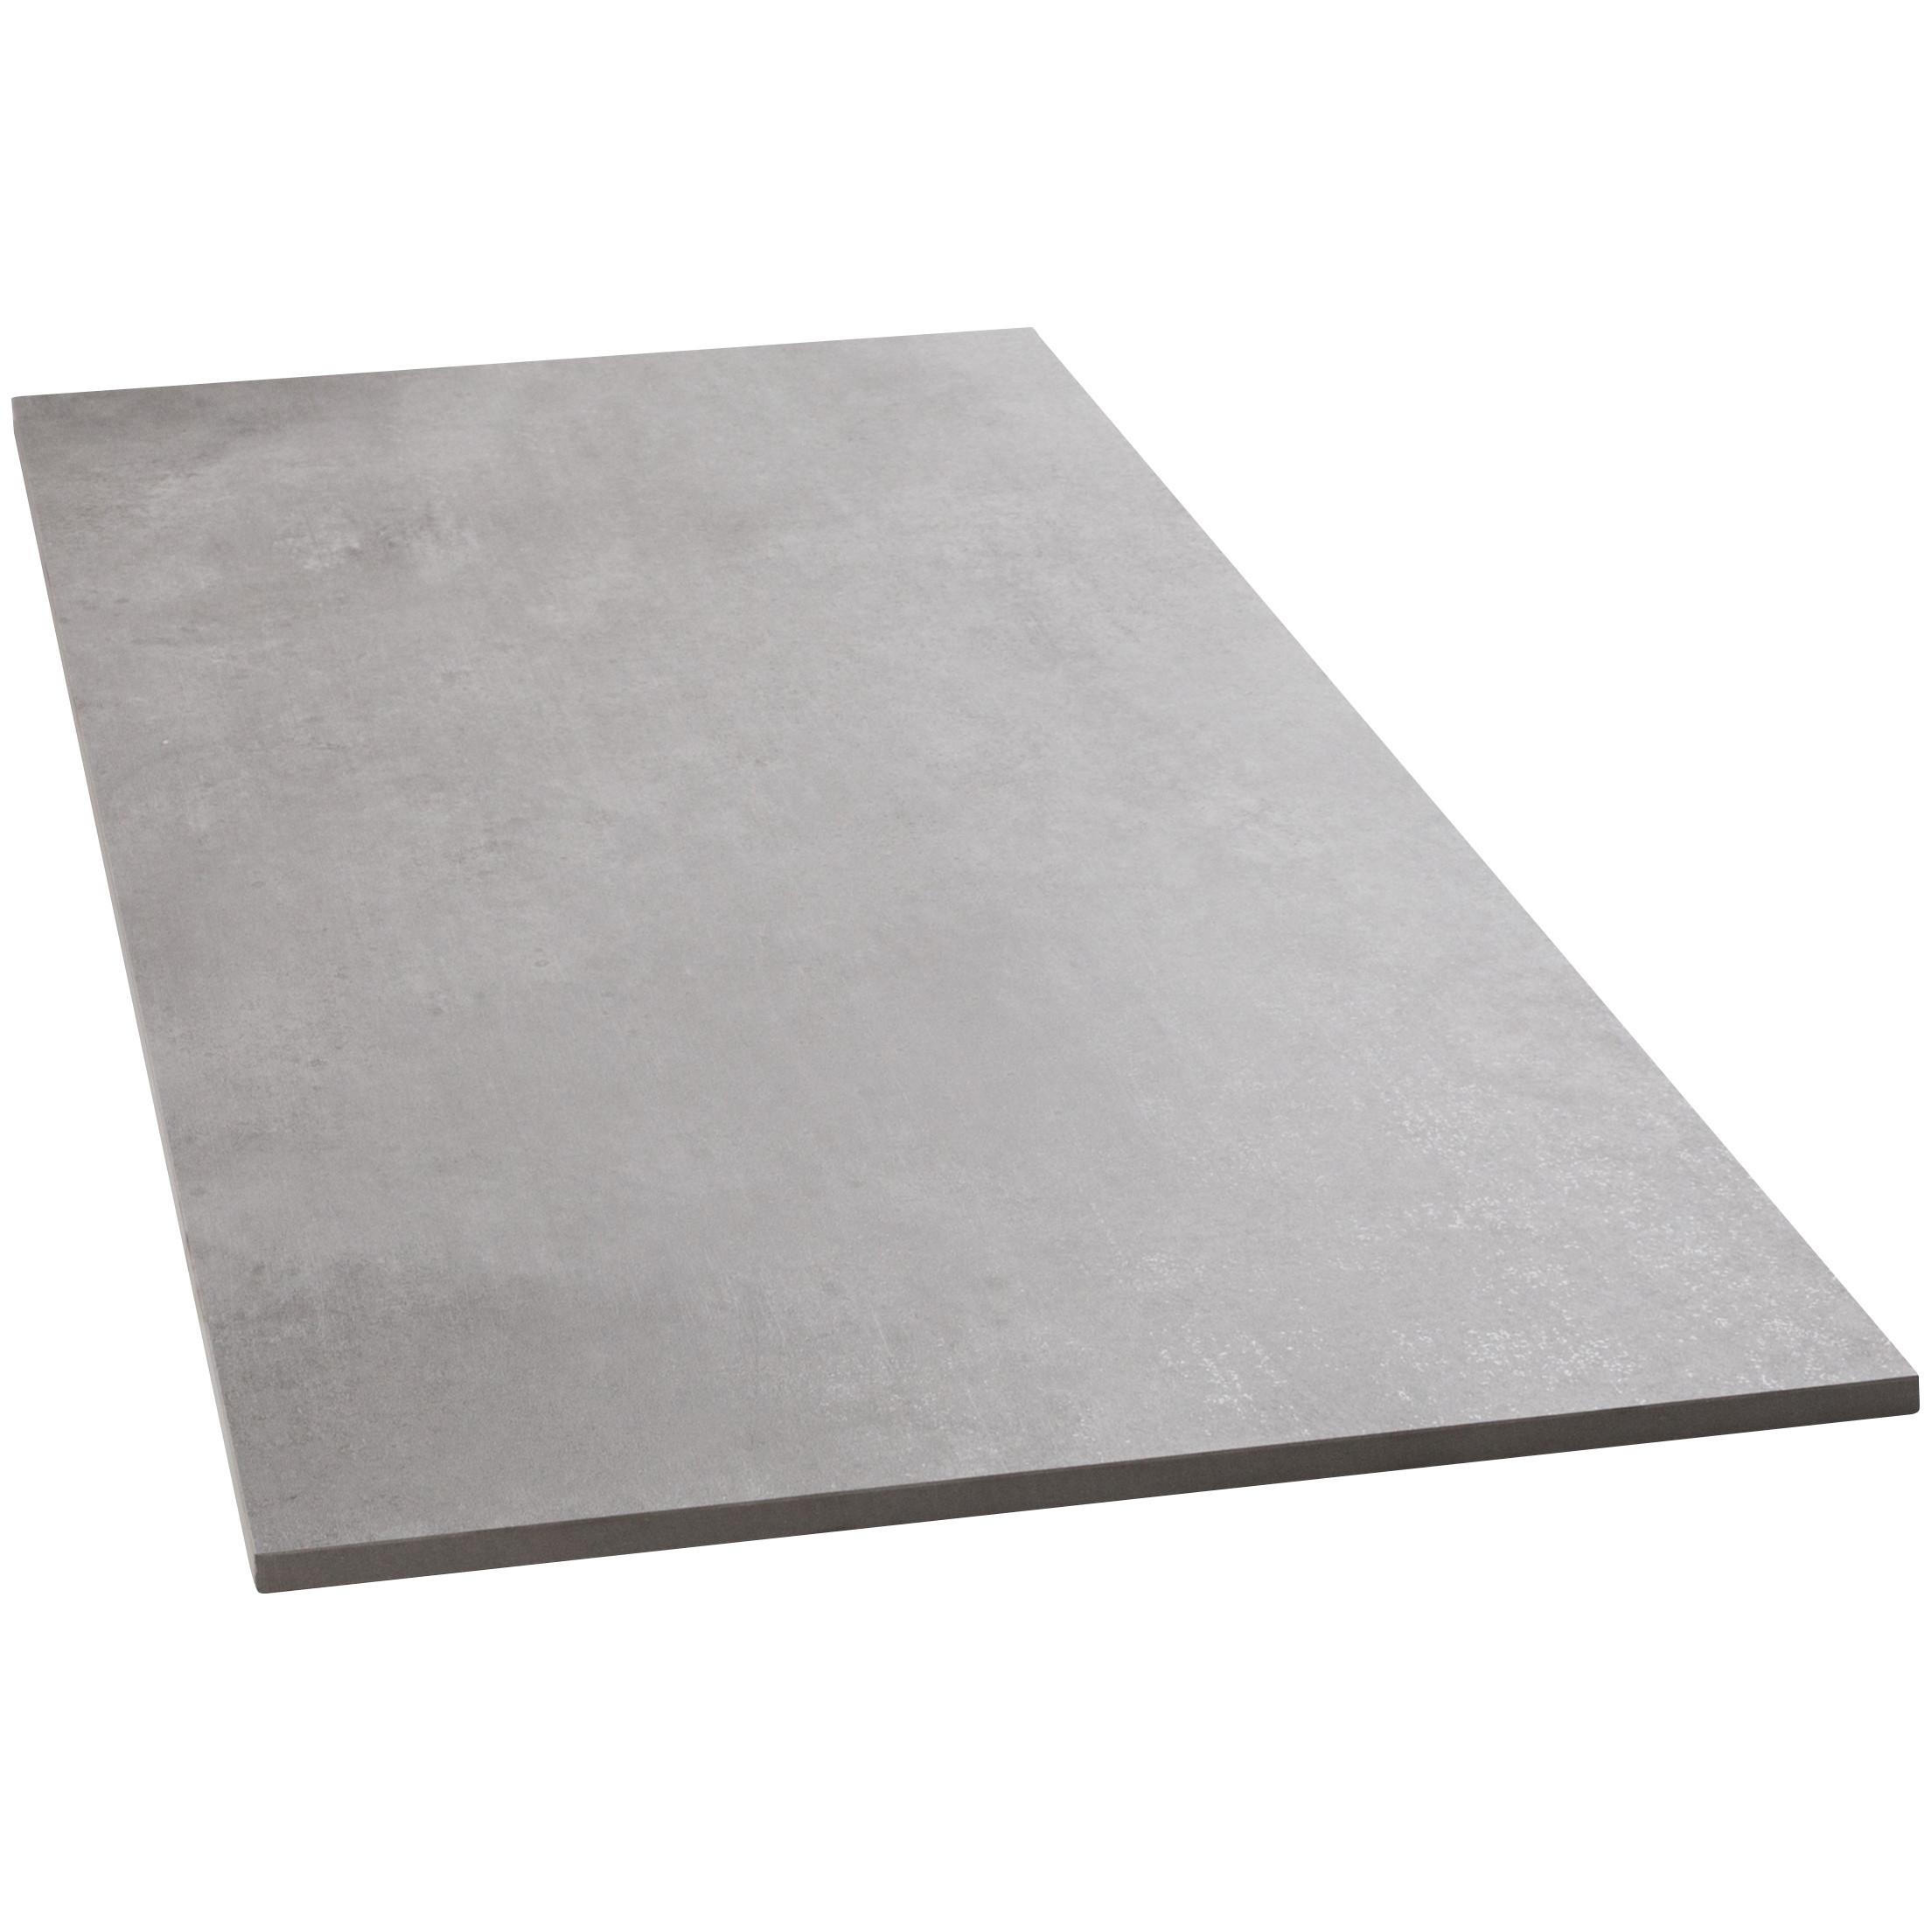 Bodenfliesen Sonderposten Beton gris matt 75x150 cm Betonoptik